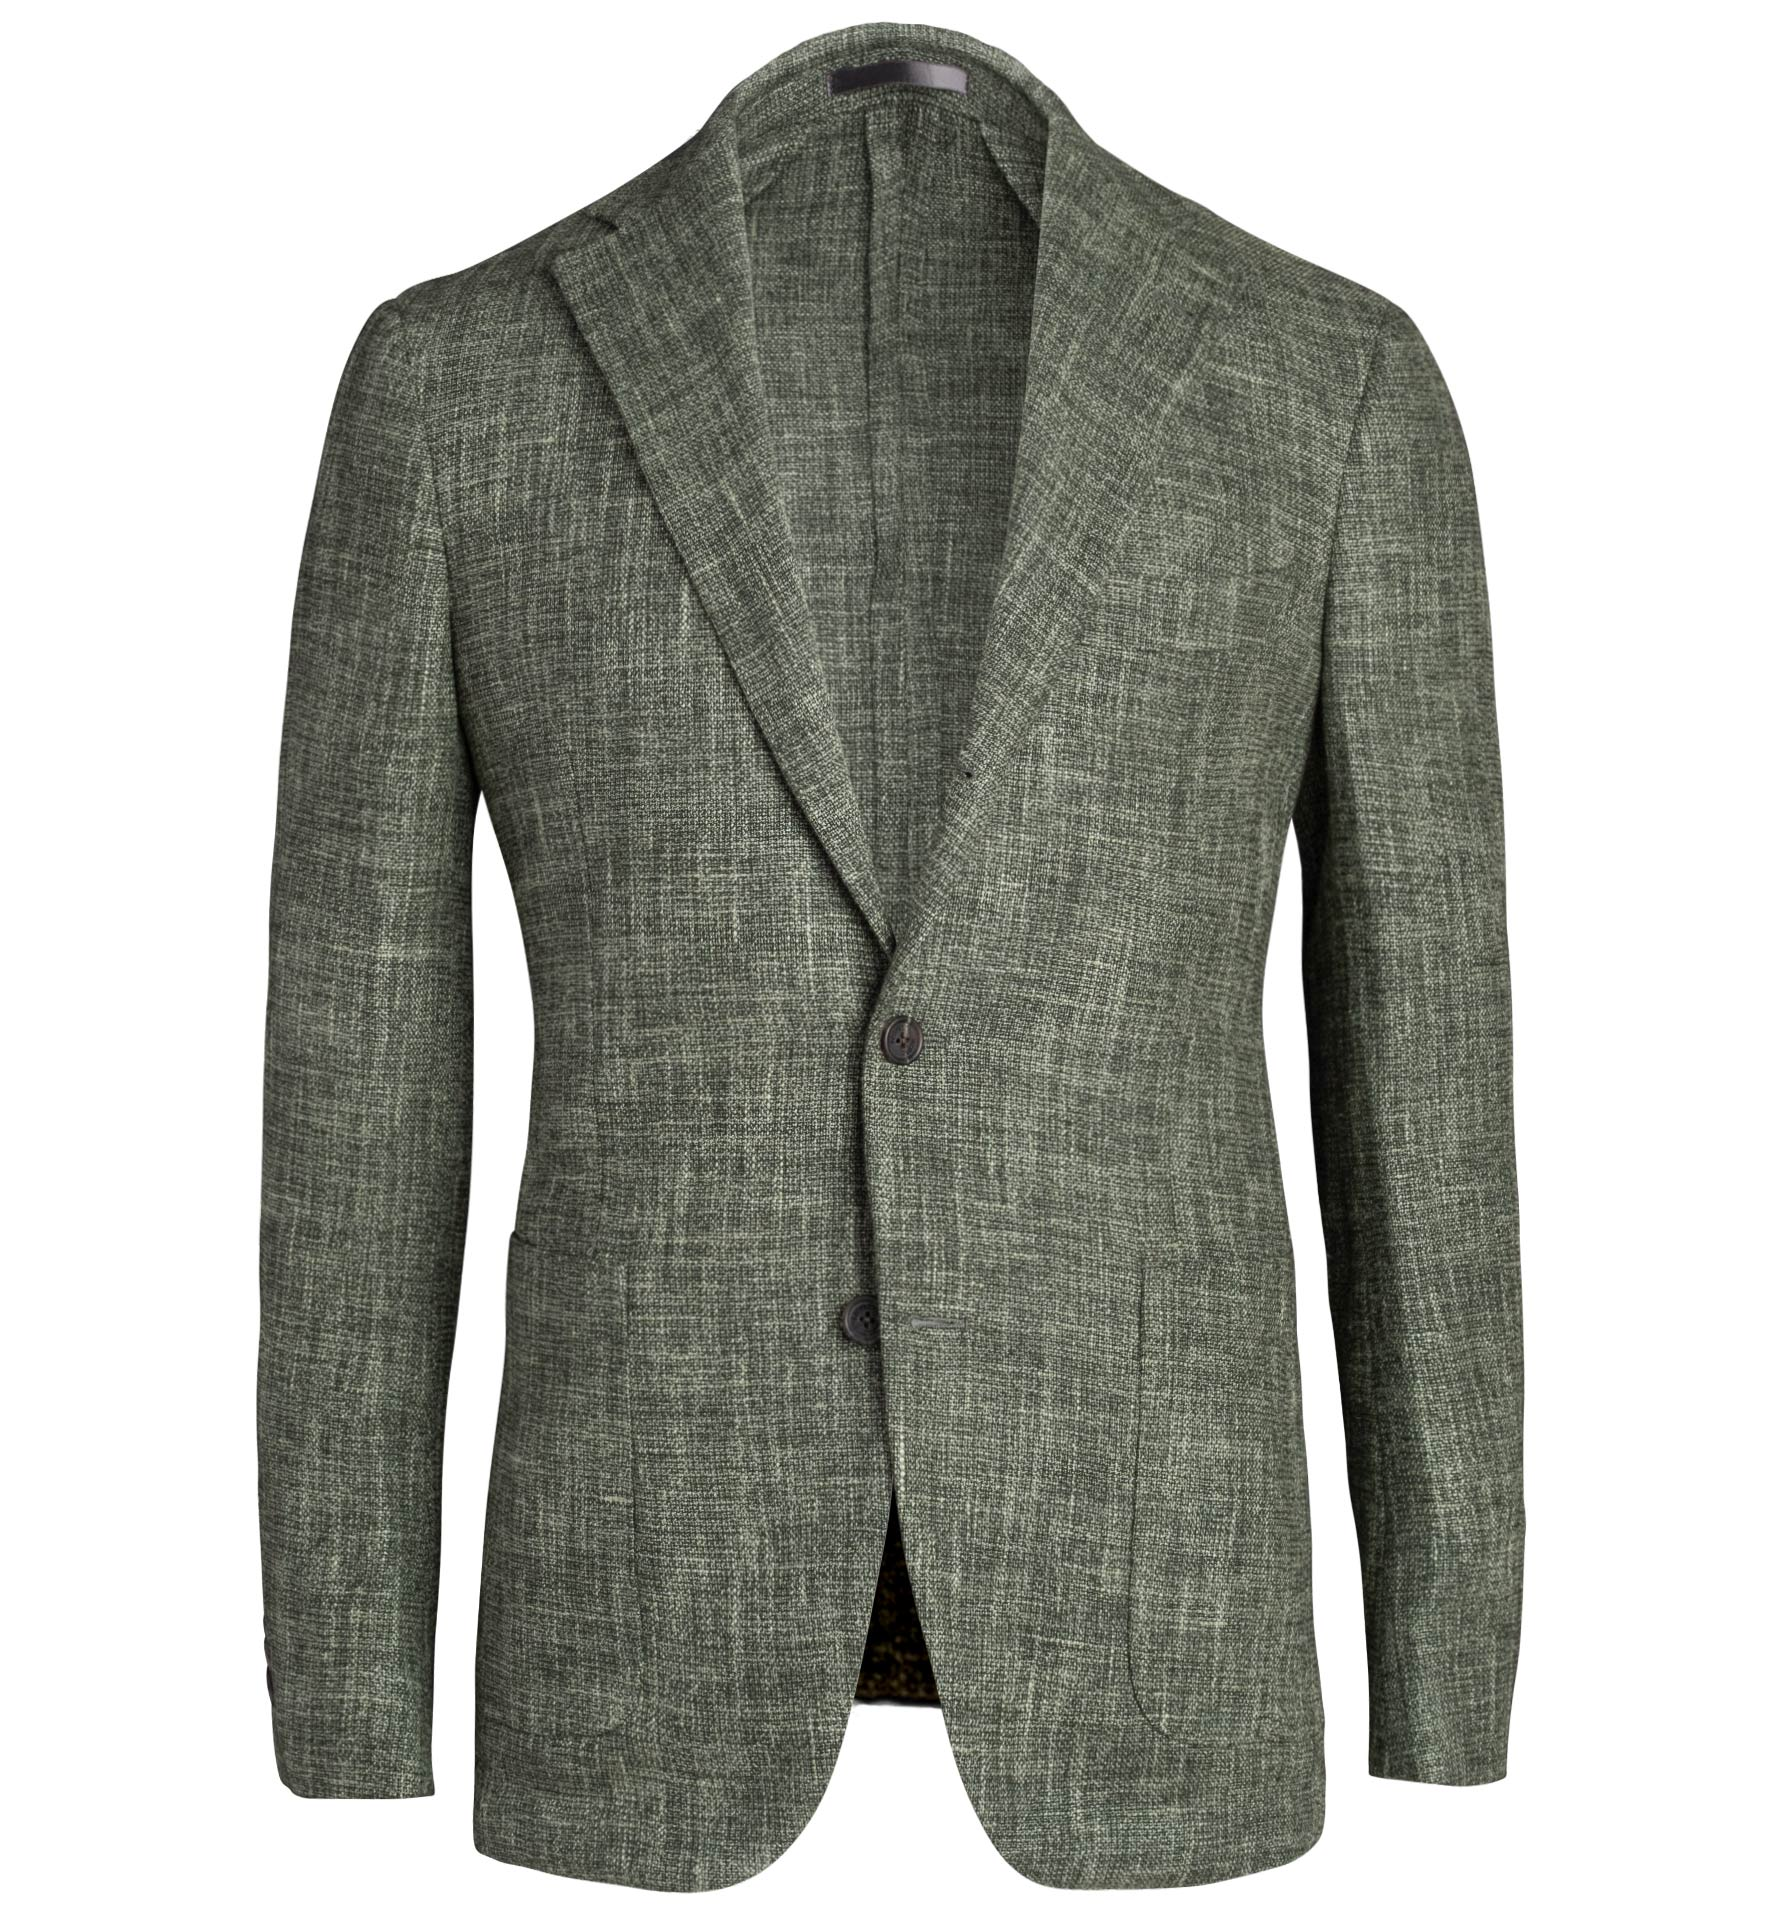 Zoom Image of Waverly Sage Slub Wool Blend Jacket